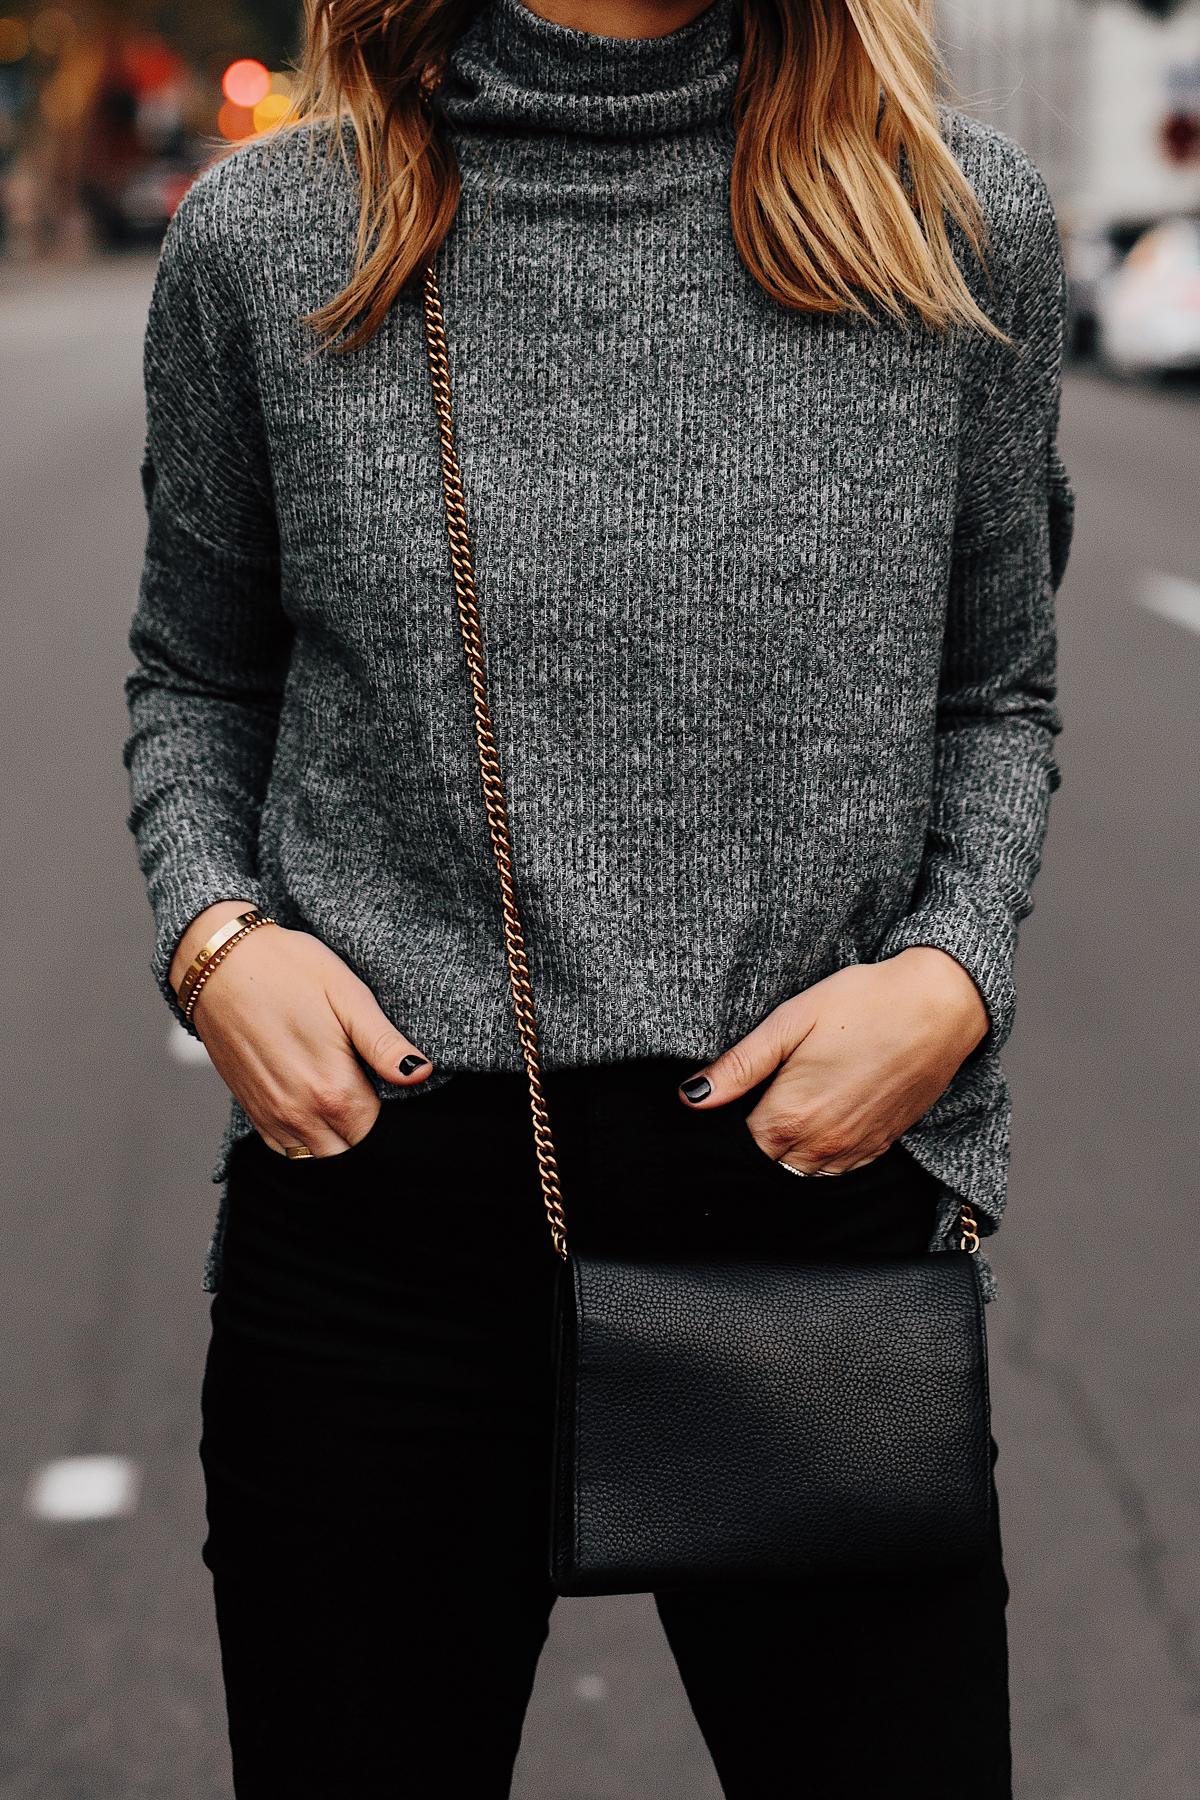 Woman Wearing Heather Grey Turtleneck Black Skinny Jeans Outfit Fashion Jackson San Diego Fashion Blogger Street Style